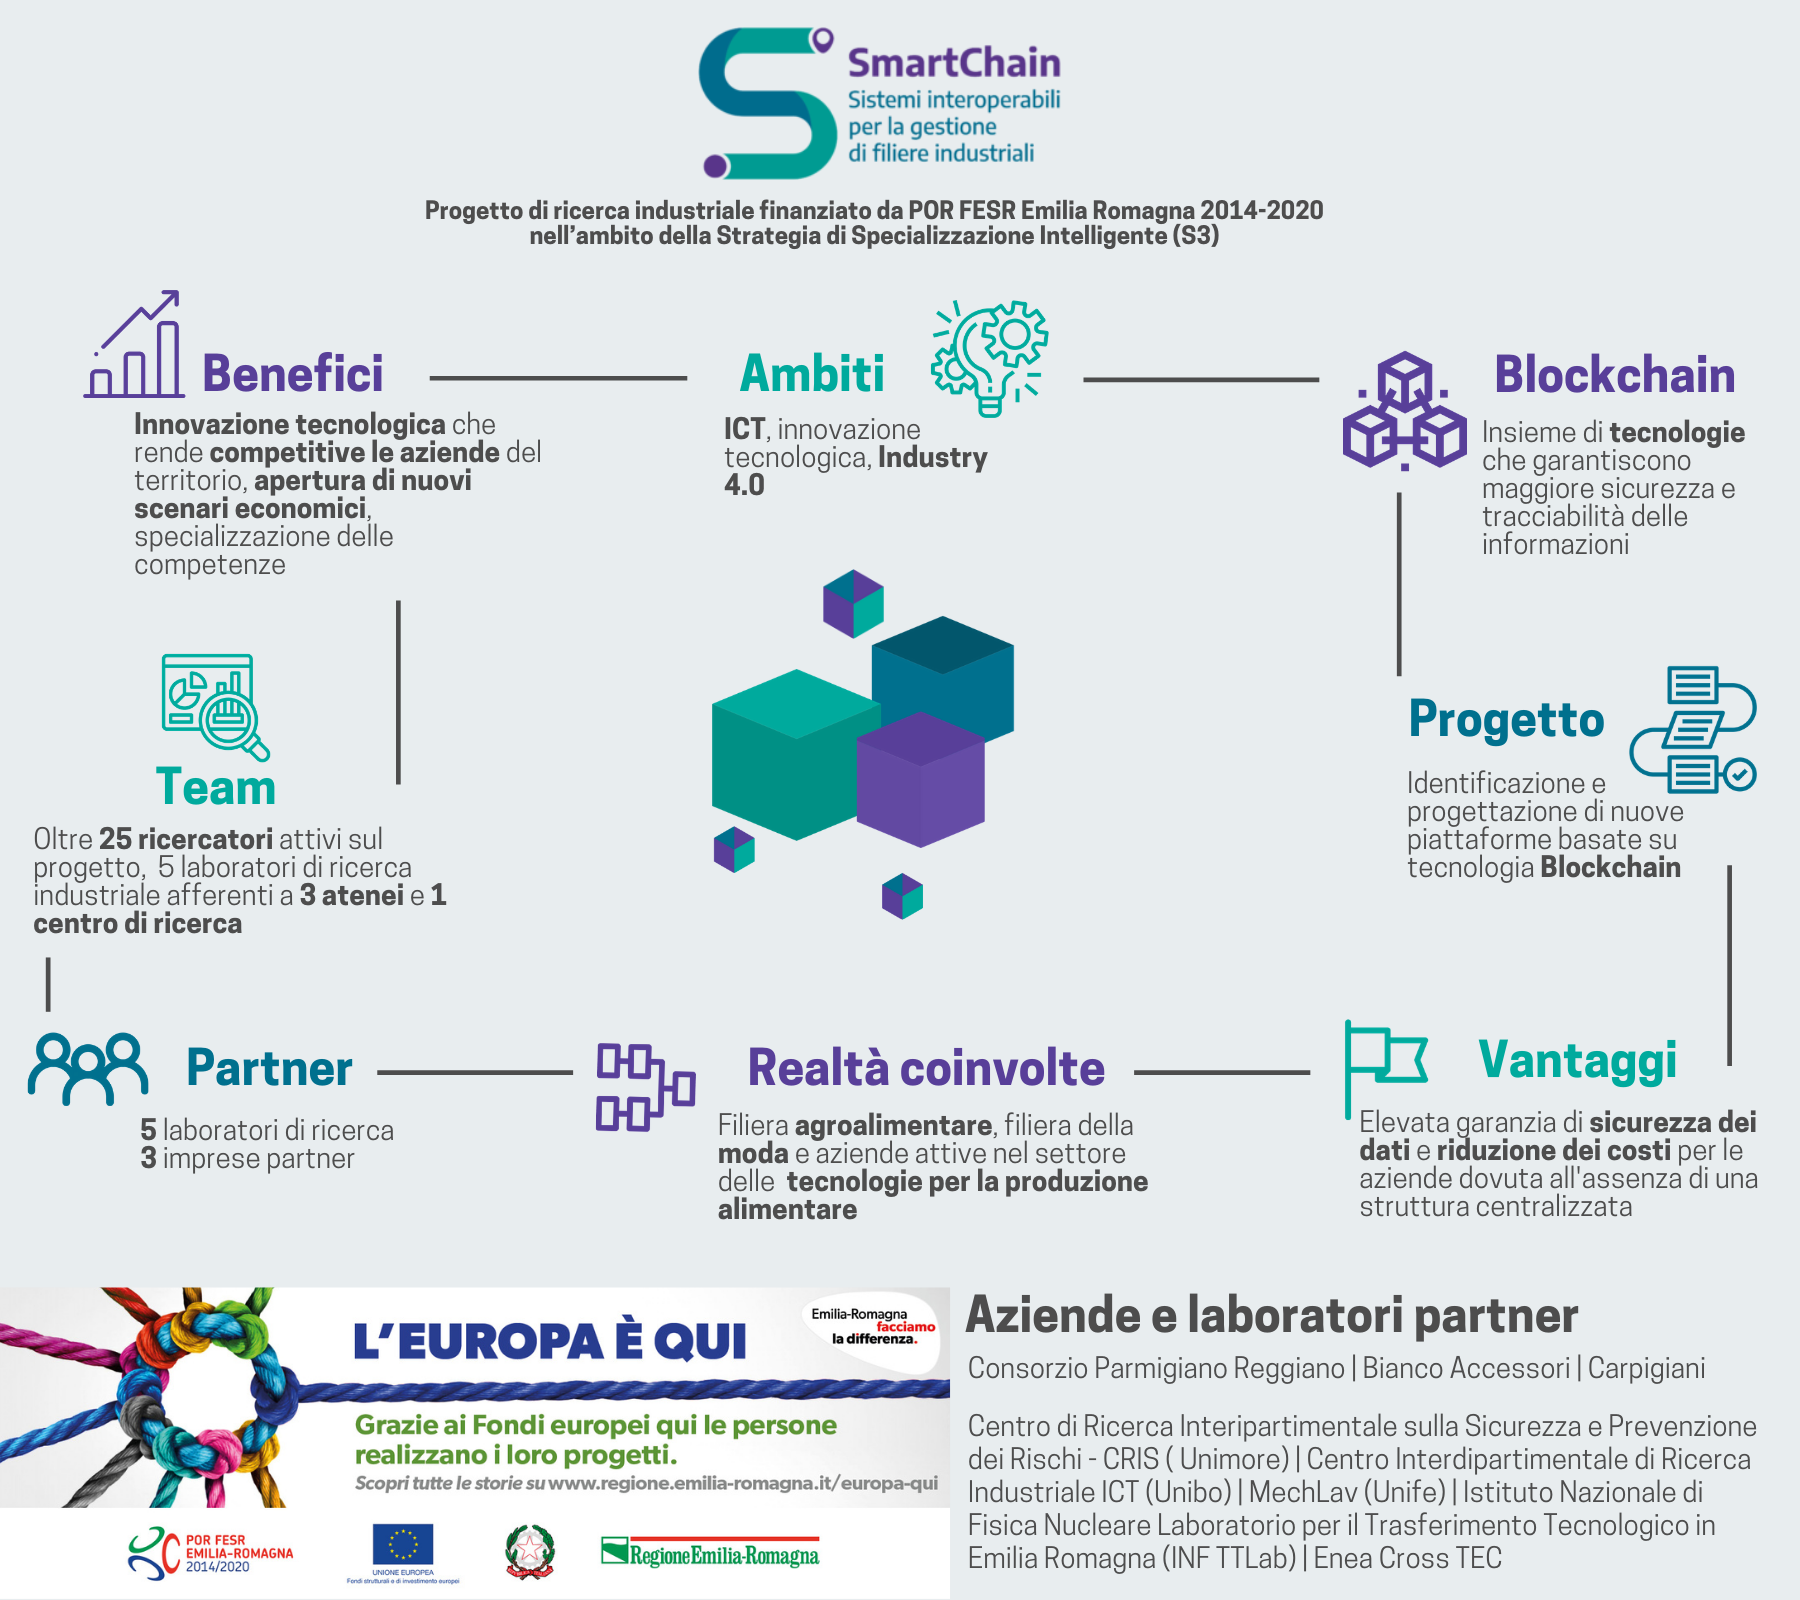 Smartchain-europa-qui-infografica